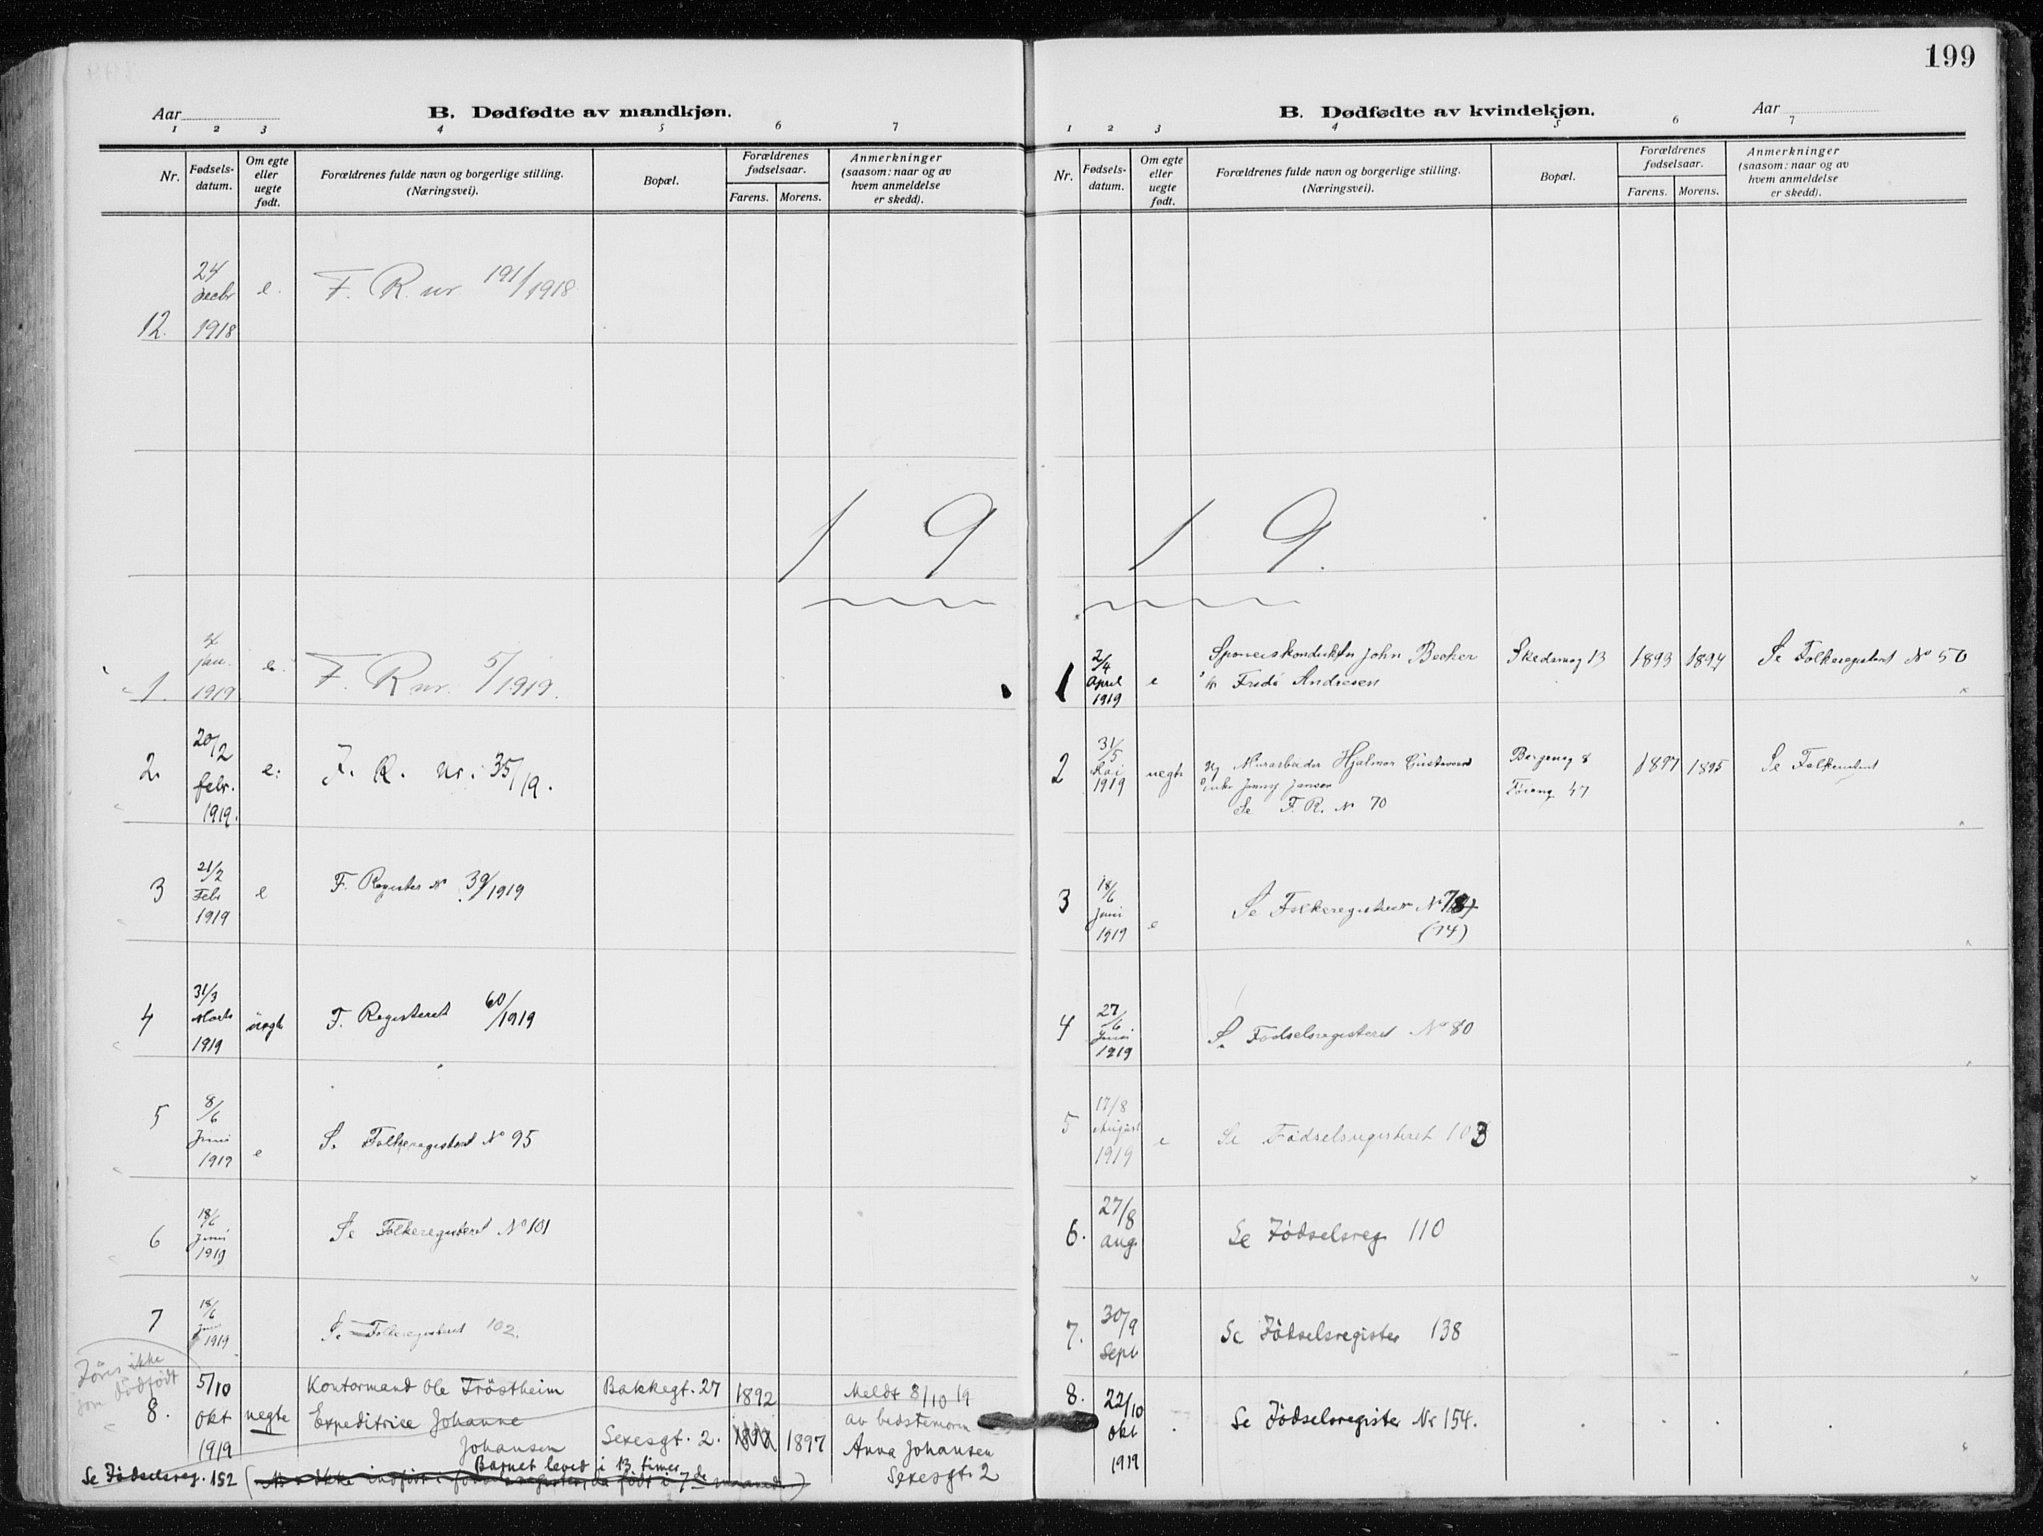 SAO, Kampen prestekontor Kirkebøker, F/Fa/L0012: Ministerialbok nr. I 12, 1916-1921, s. 199